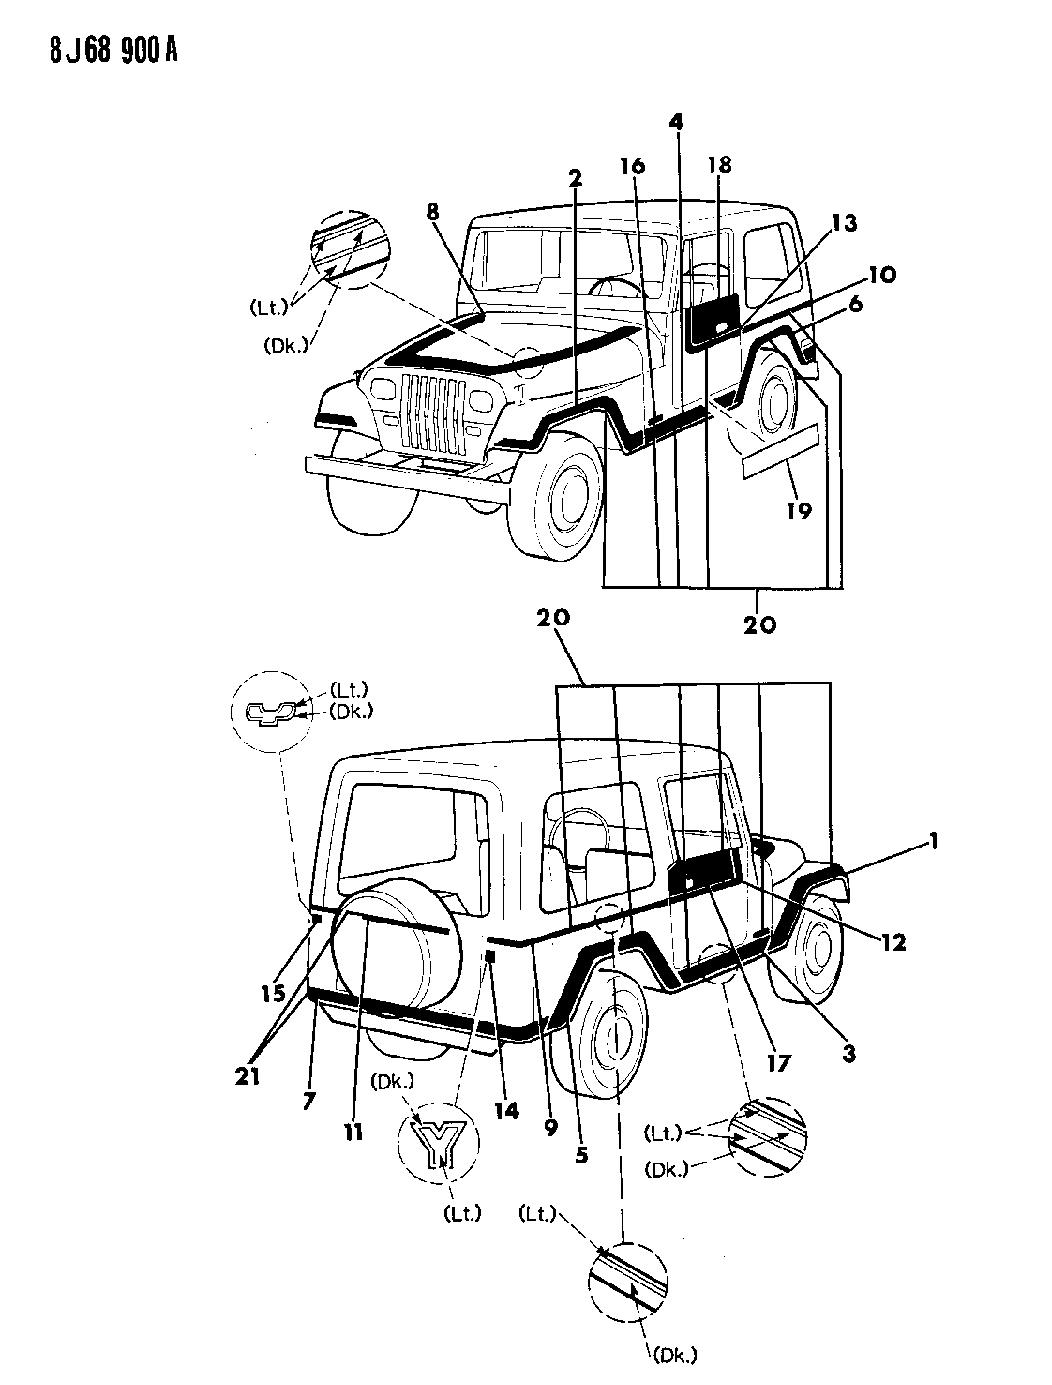 1987 Jeep Wrangler 4 2l Engine Diagram. Jeep. Wiring